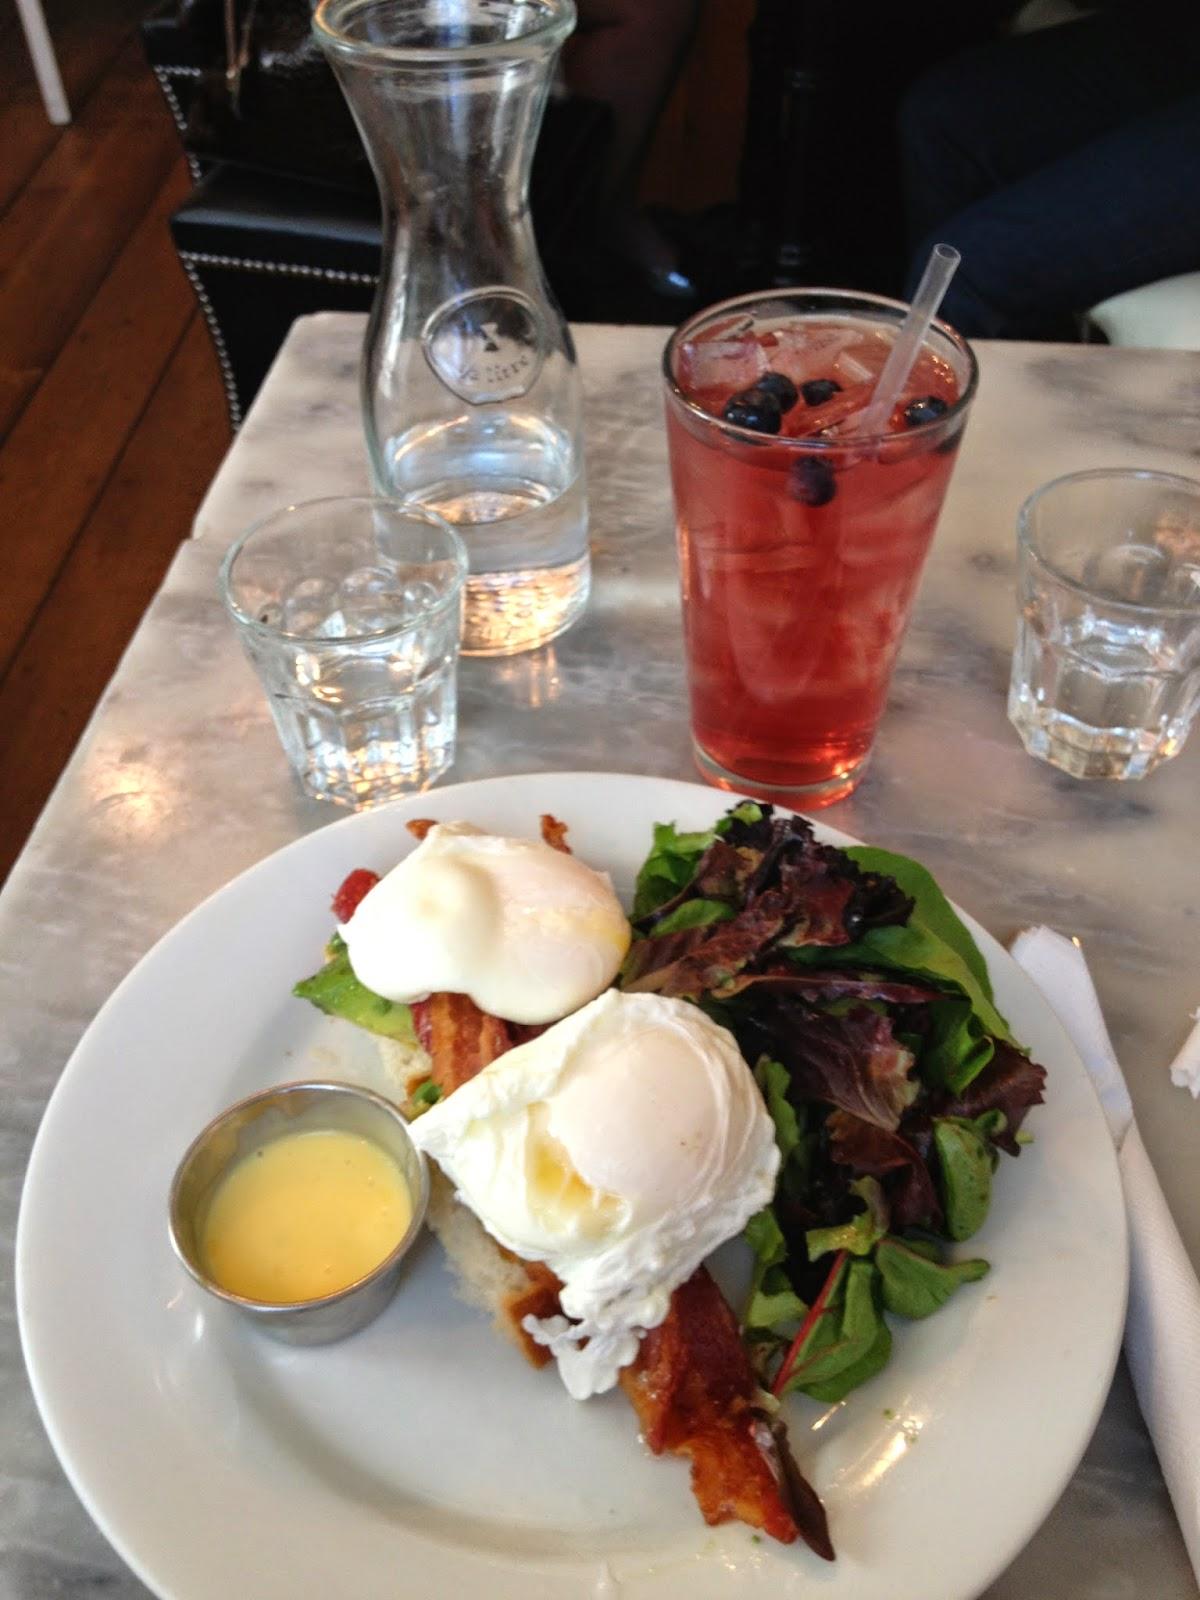 duck and bunny 2014 food blog providence rhode island